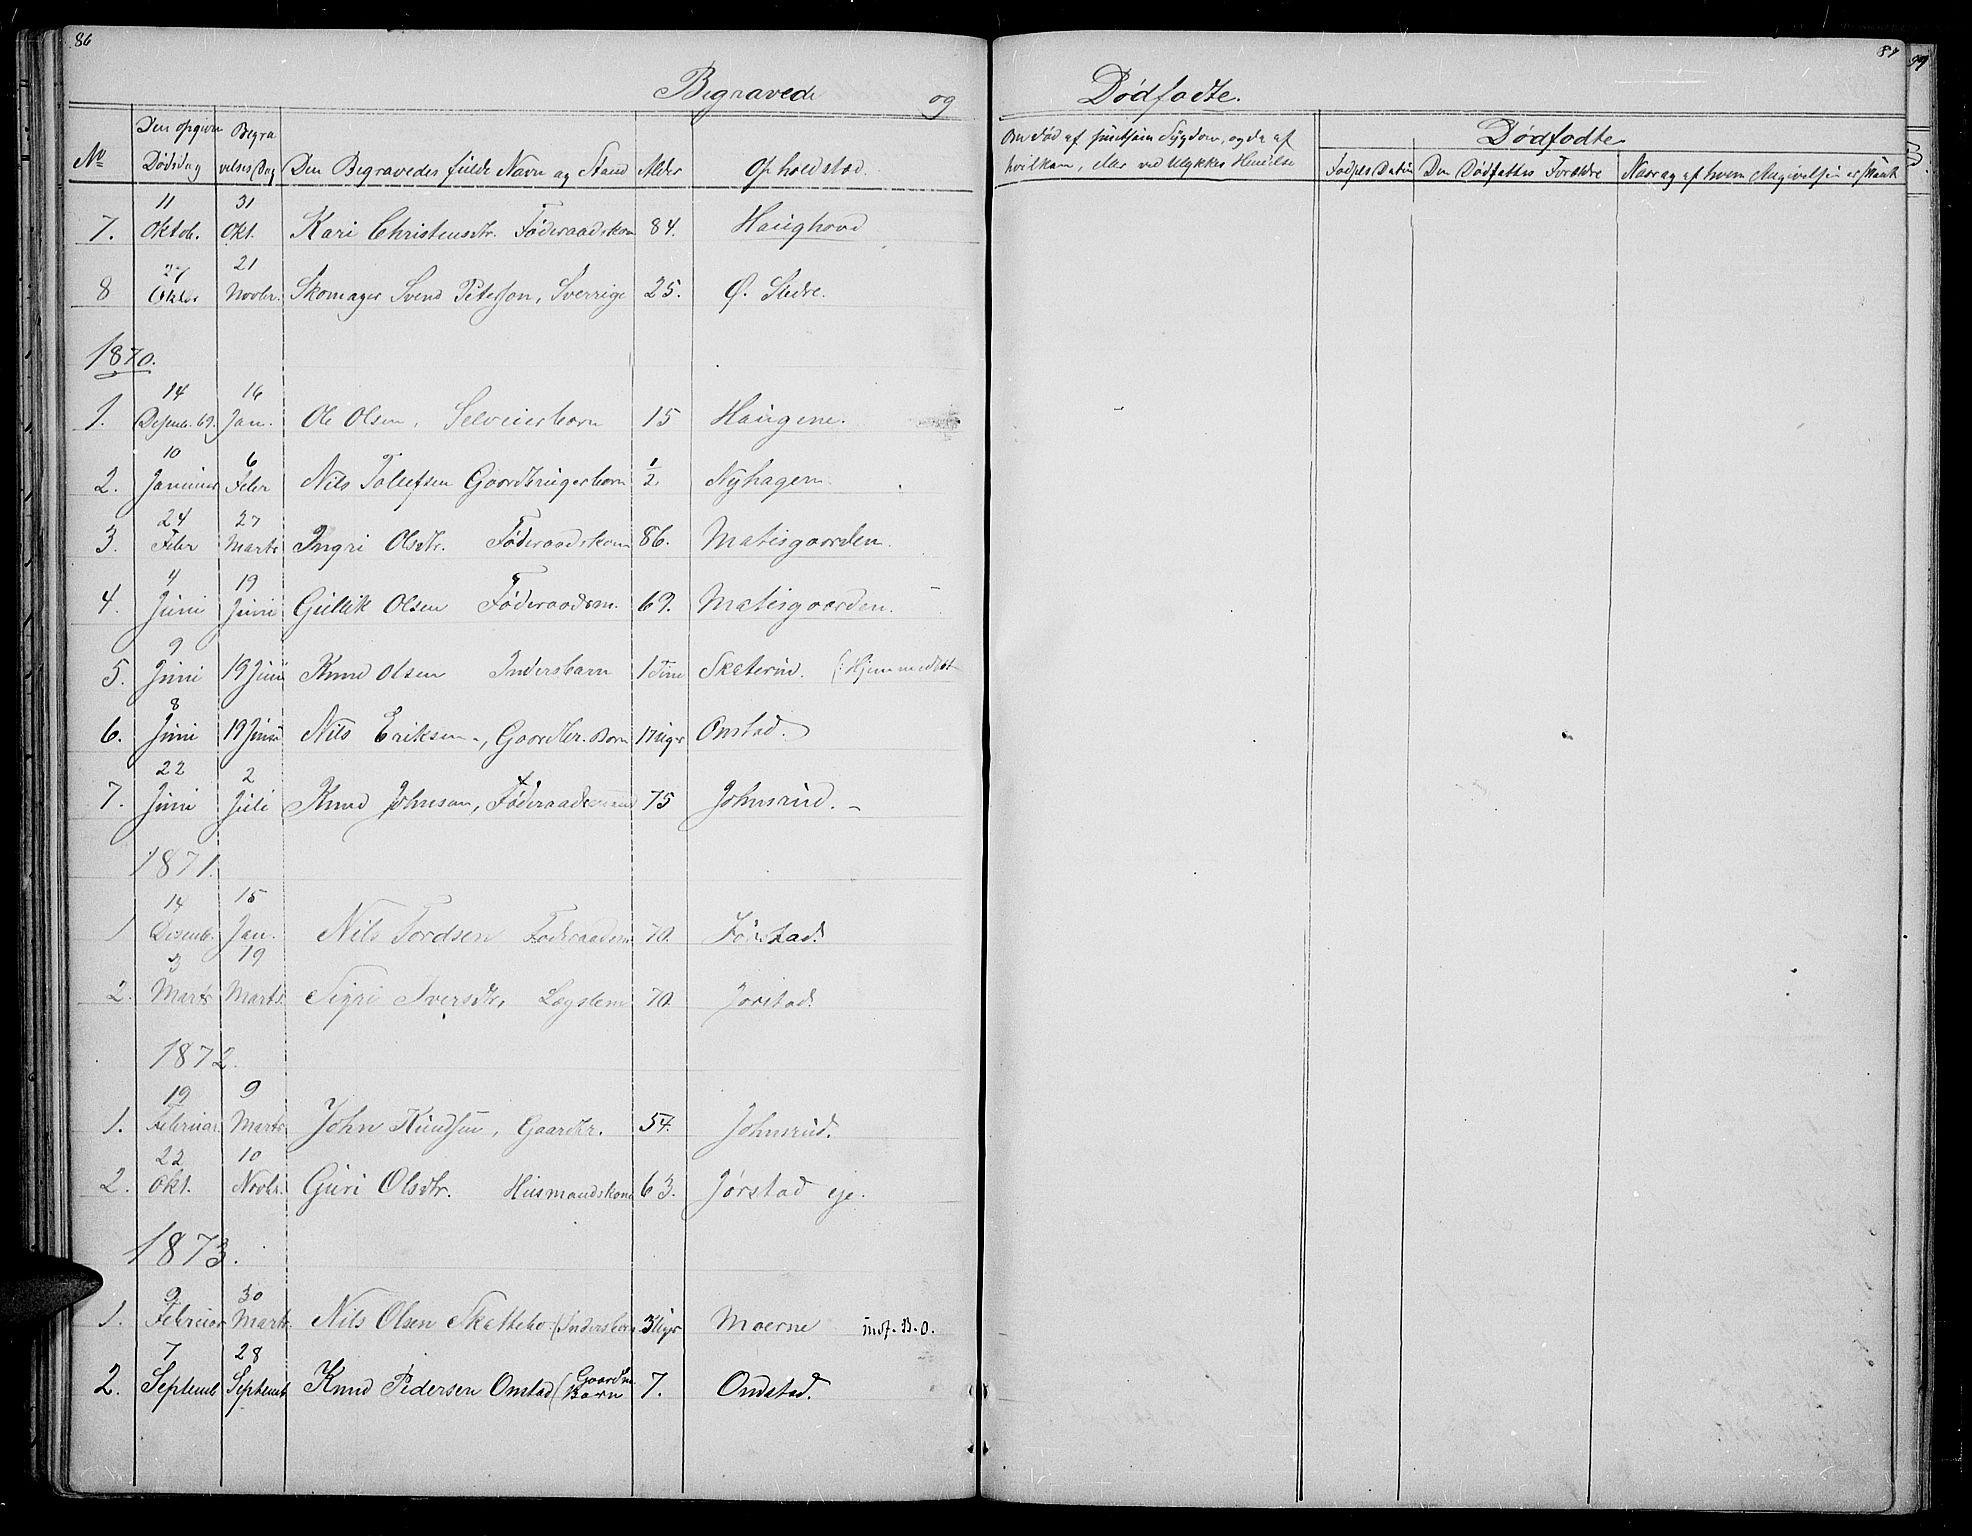 SAH, Øystre Slidre prestekontor, Klokkerbok nr. 2, 1866-1886, s. 86-87